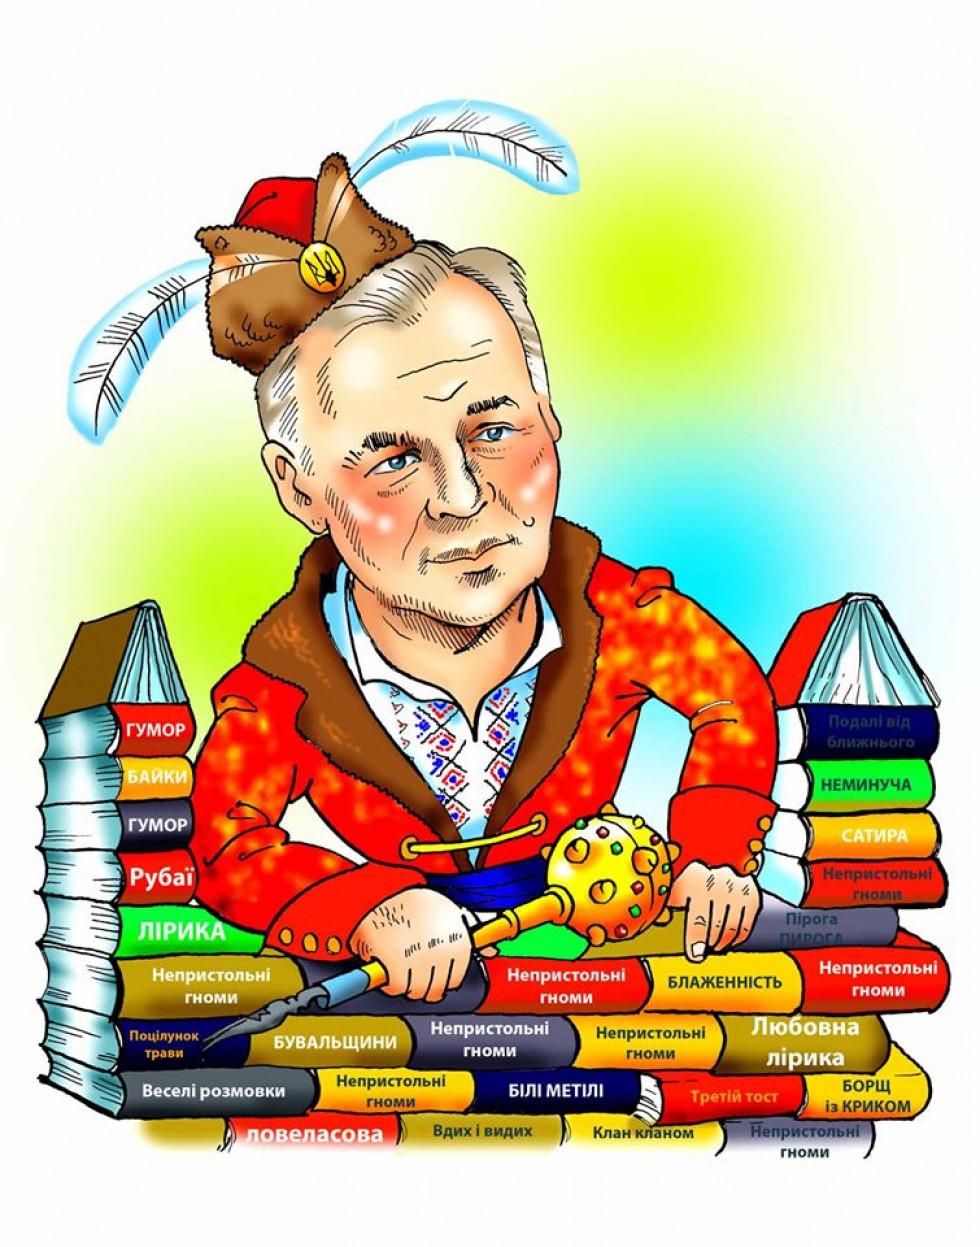 Екс-редактор газети «Віче» Василь Простопчук